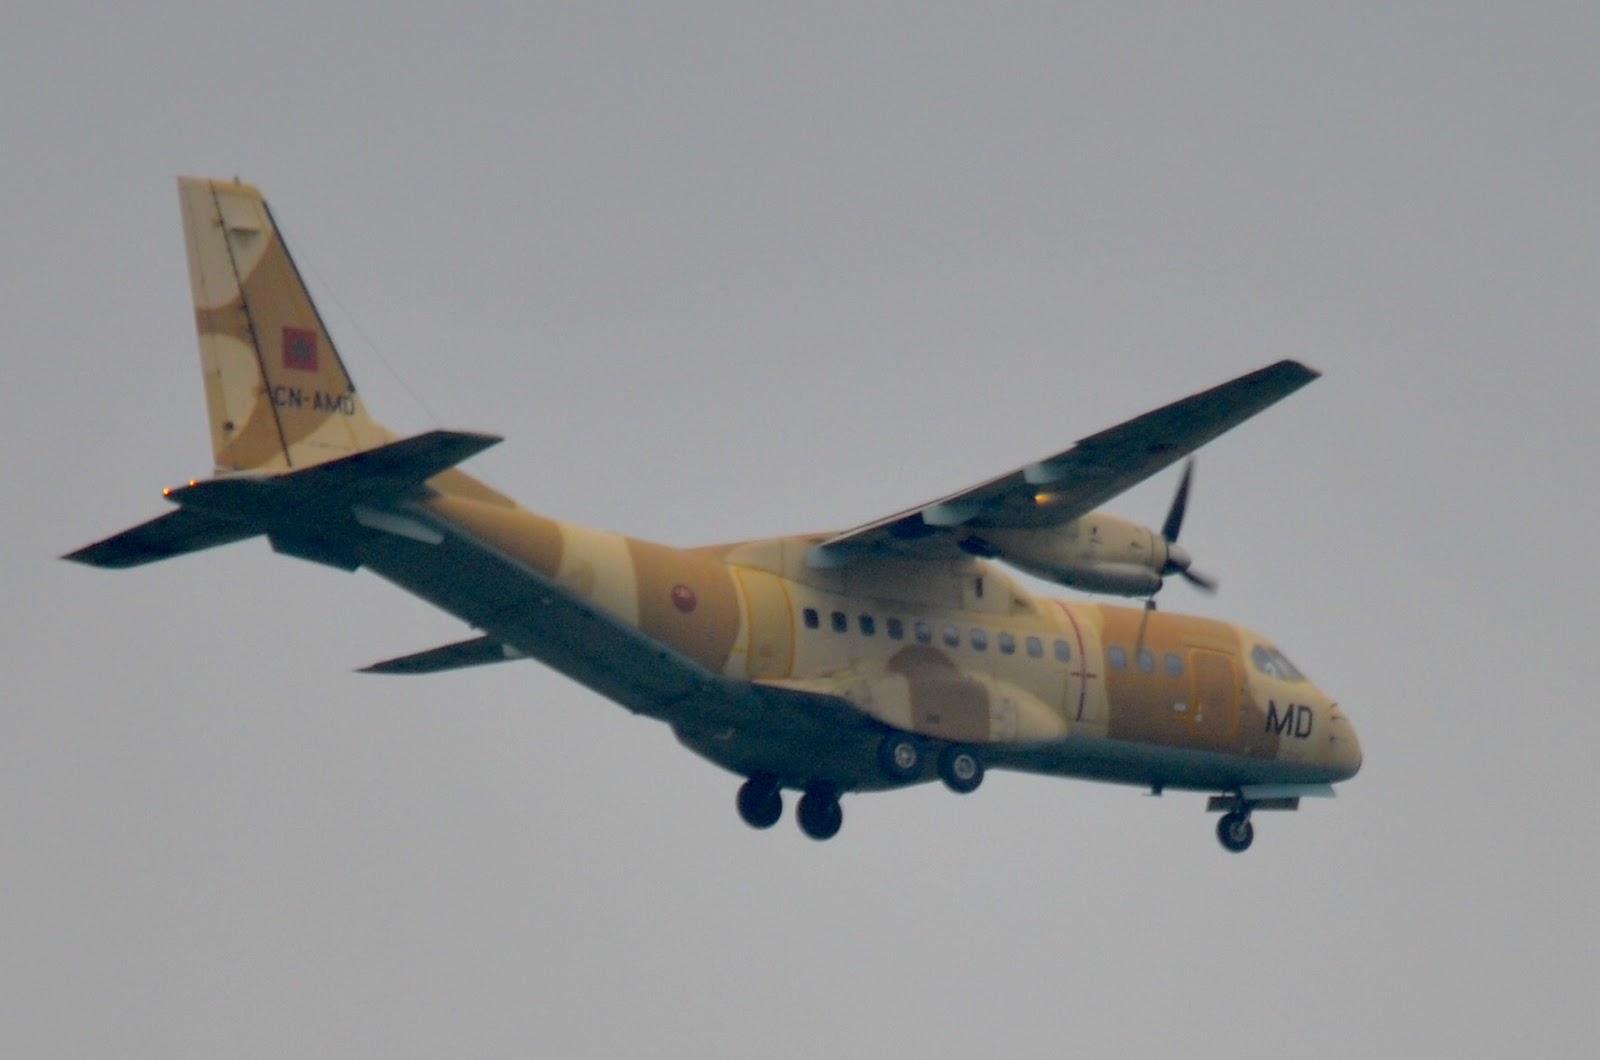 FRA: Photos d'avions de transport - Page 31 FullSizeRender